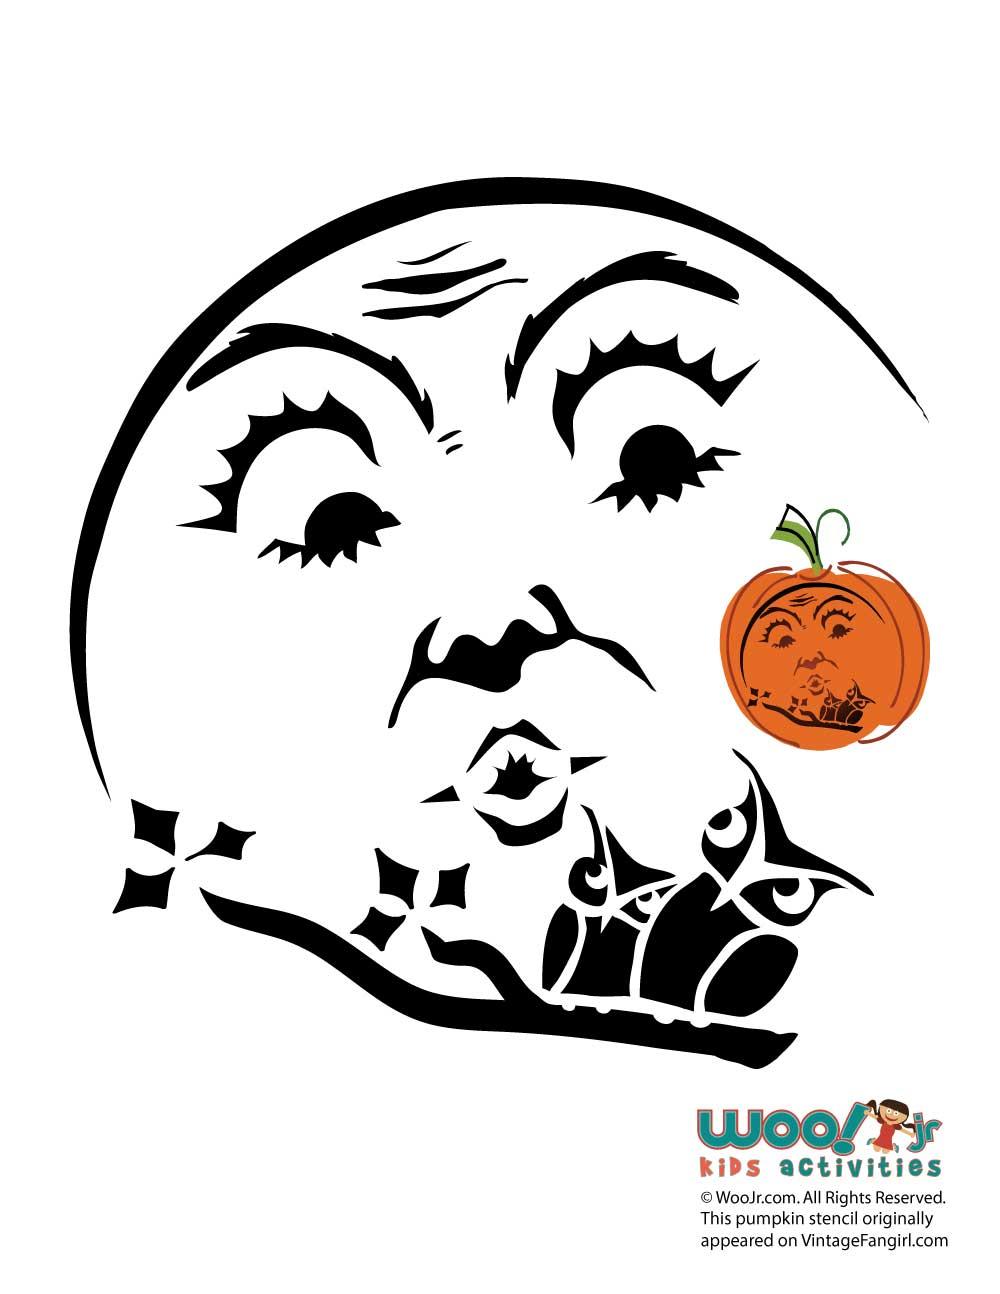 Owl Pumpkin Carving Stencils   Woo! Jr. Kids Activities